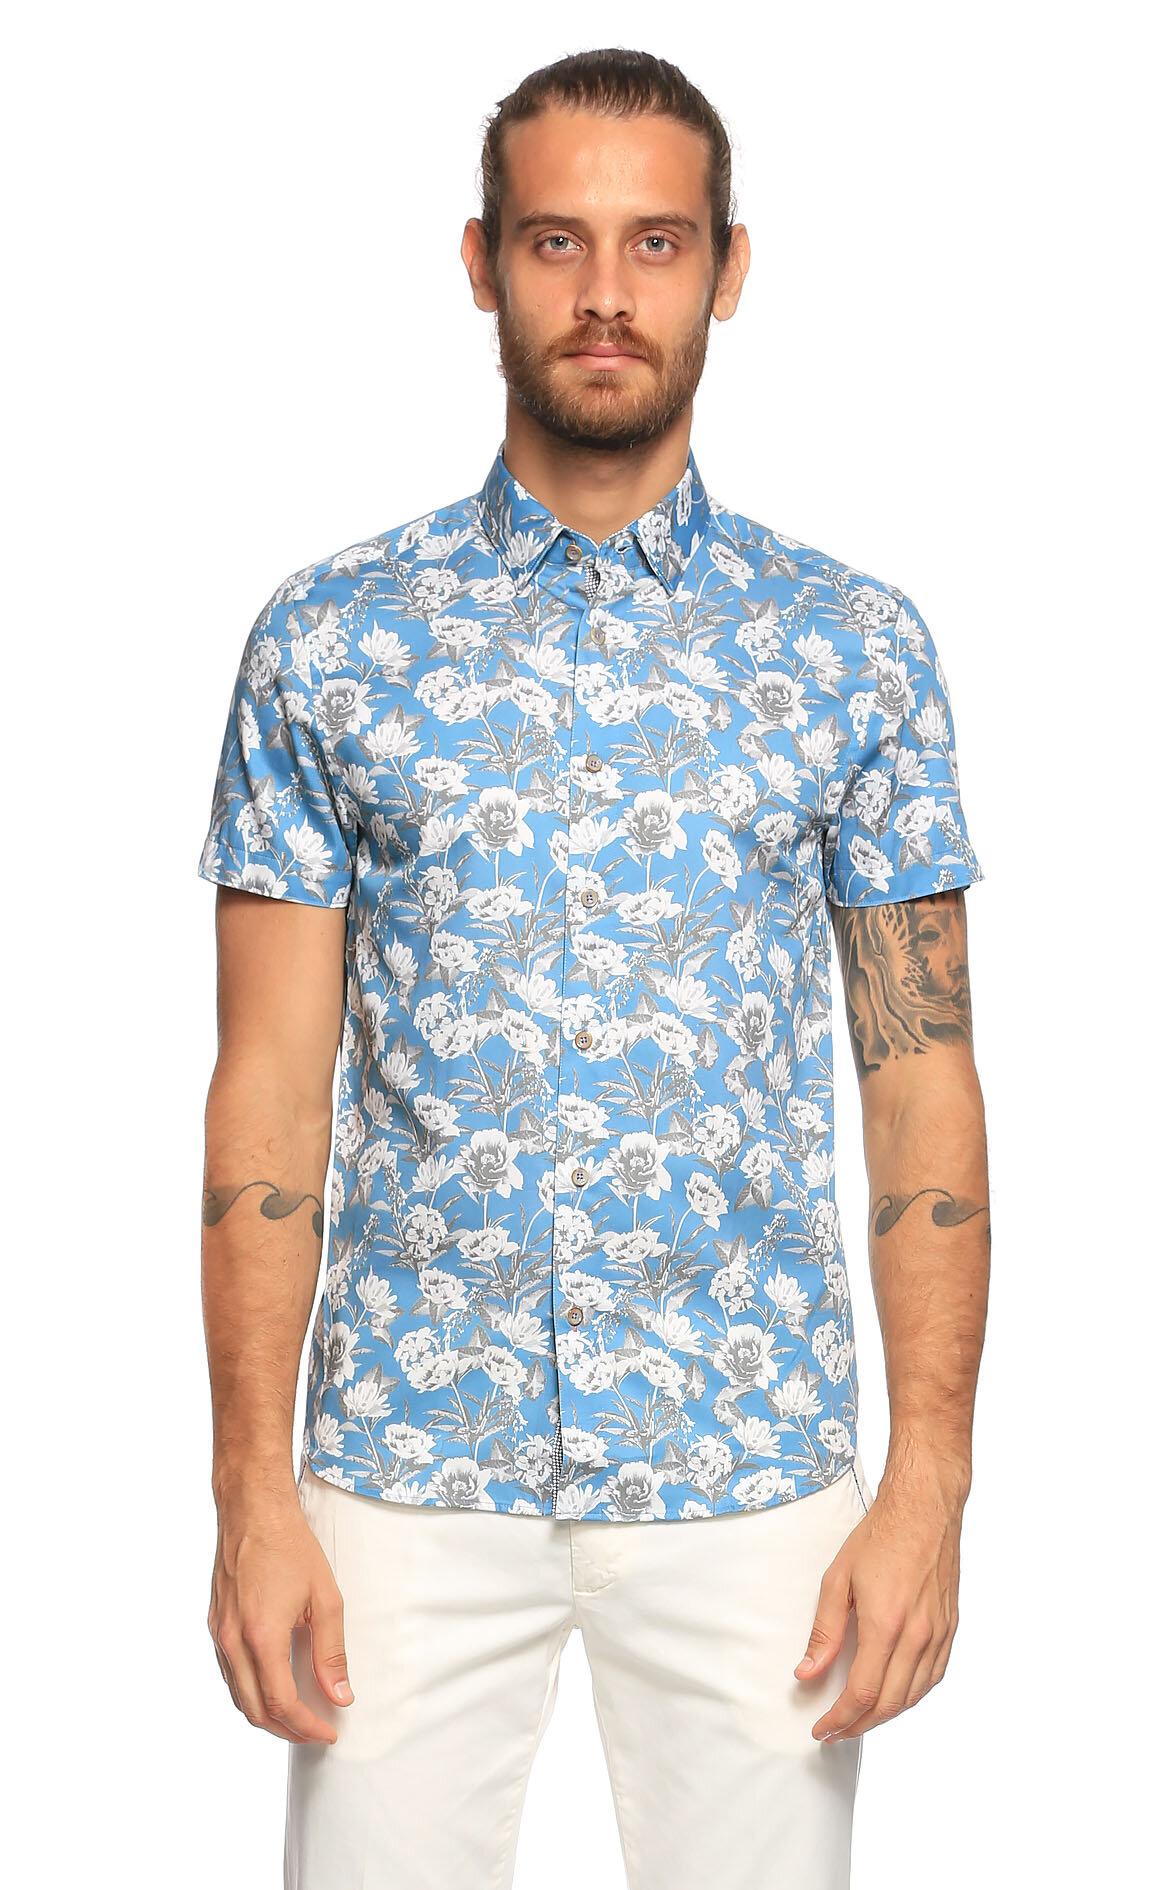 702c6c54a2781 Ted Baker Erkek Mavi Gömlek TEDTH9MPEACHYBLUE-BLUE - Brandroom